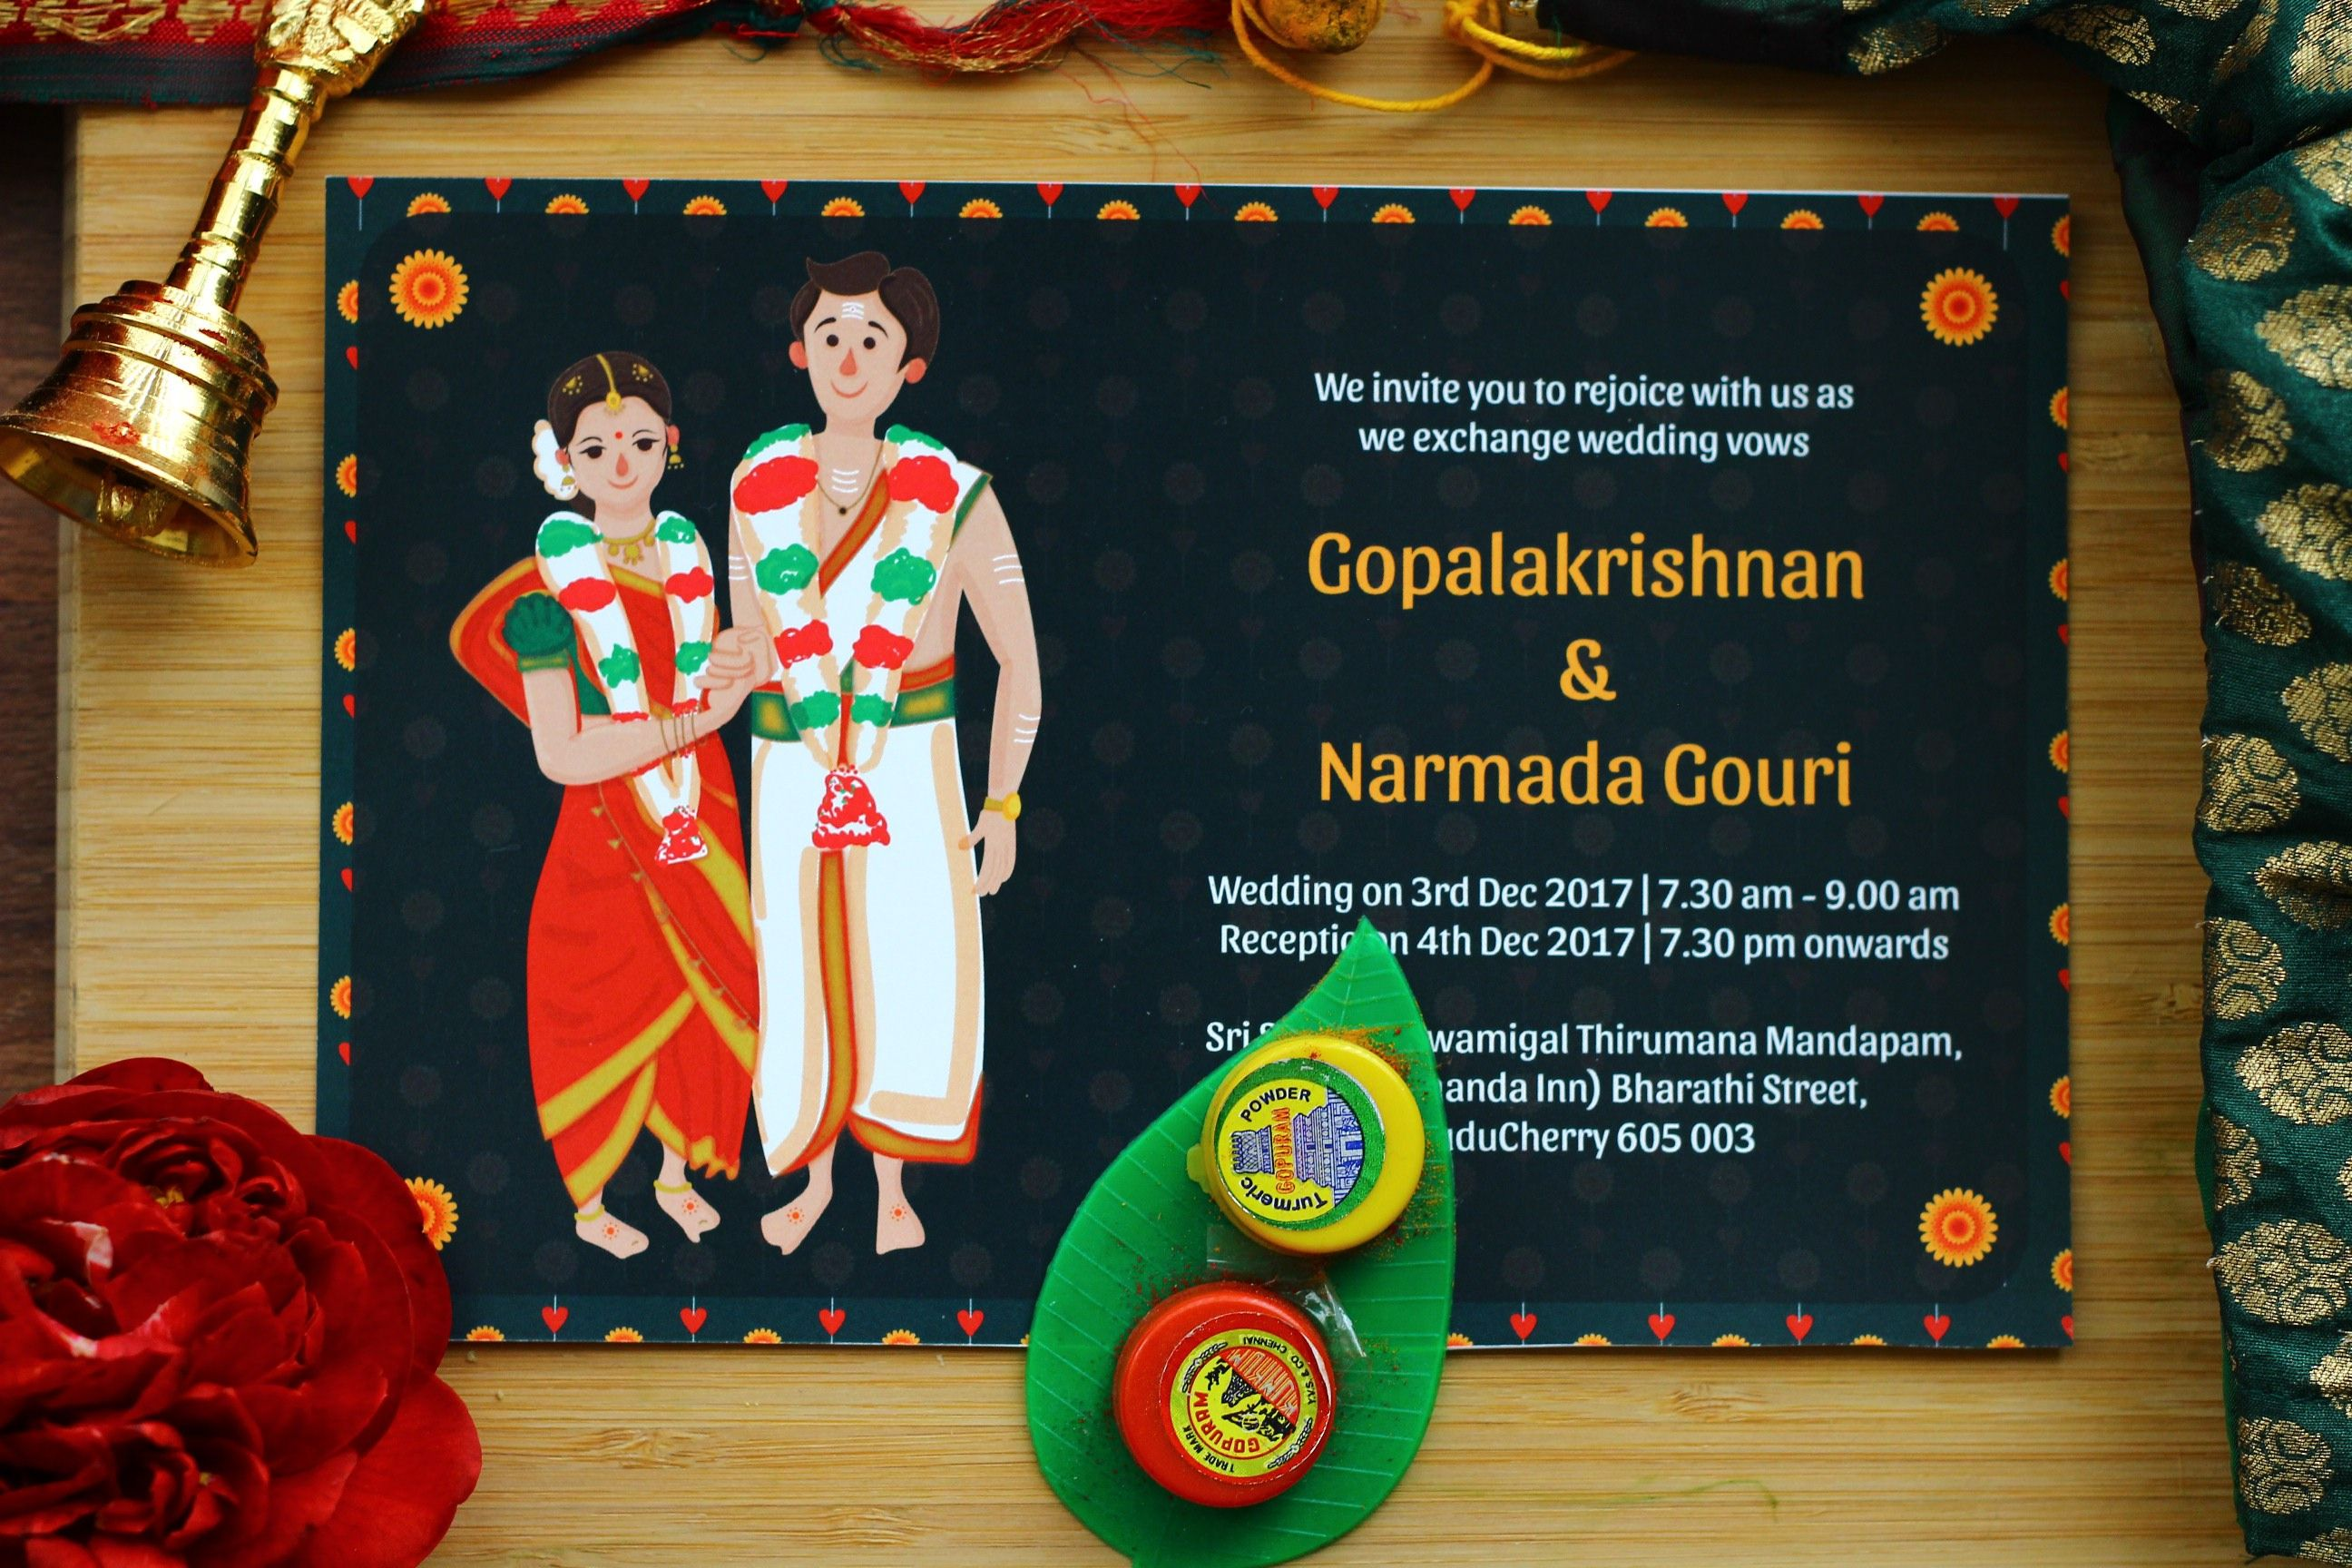 A Fun Customized Tambrahm Wedding Invitation Illustrated To Shou Illustrated Wedding Invitations Traditional Wedding Invitations Wedding Invitation Card Design